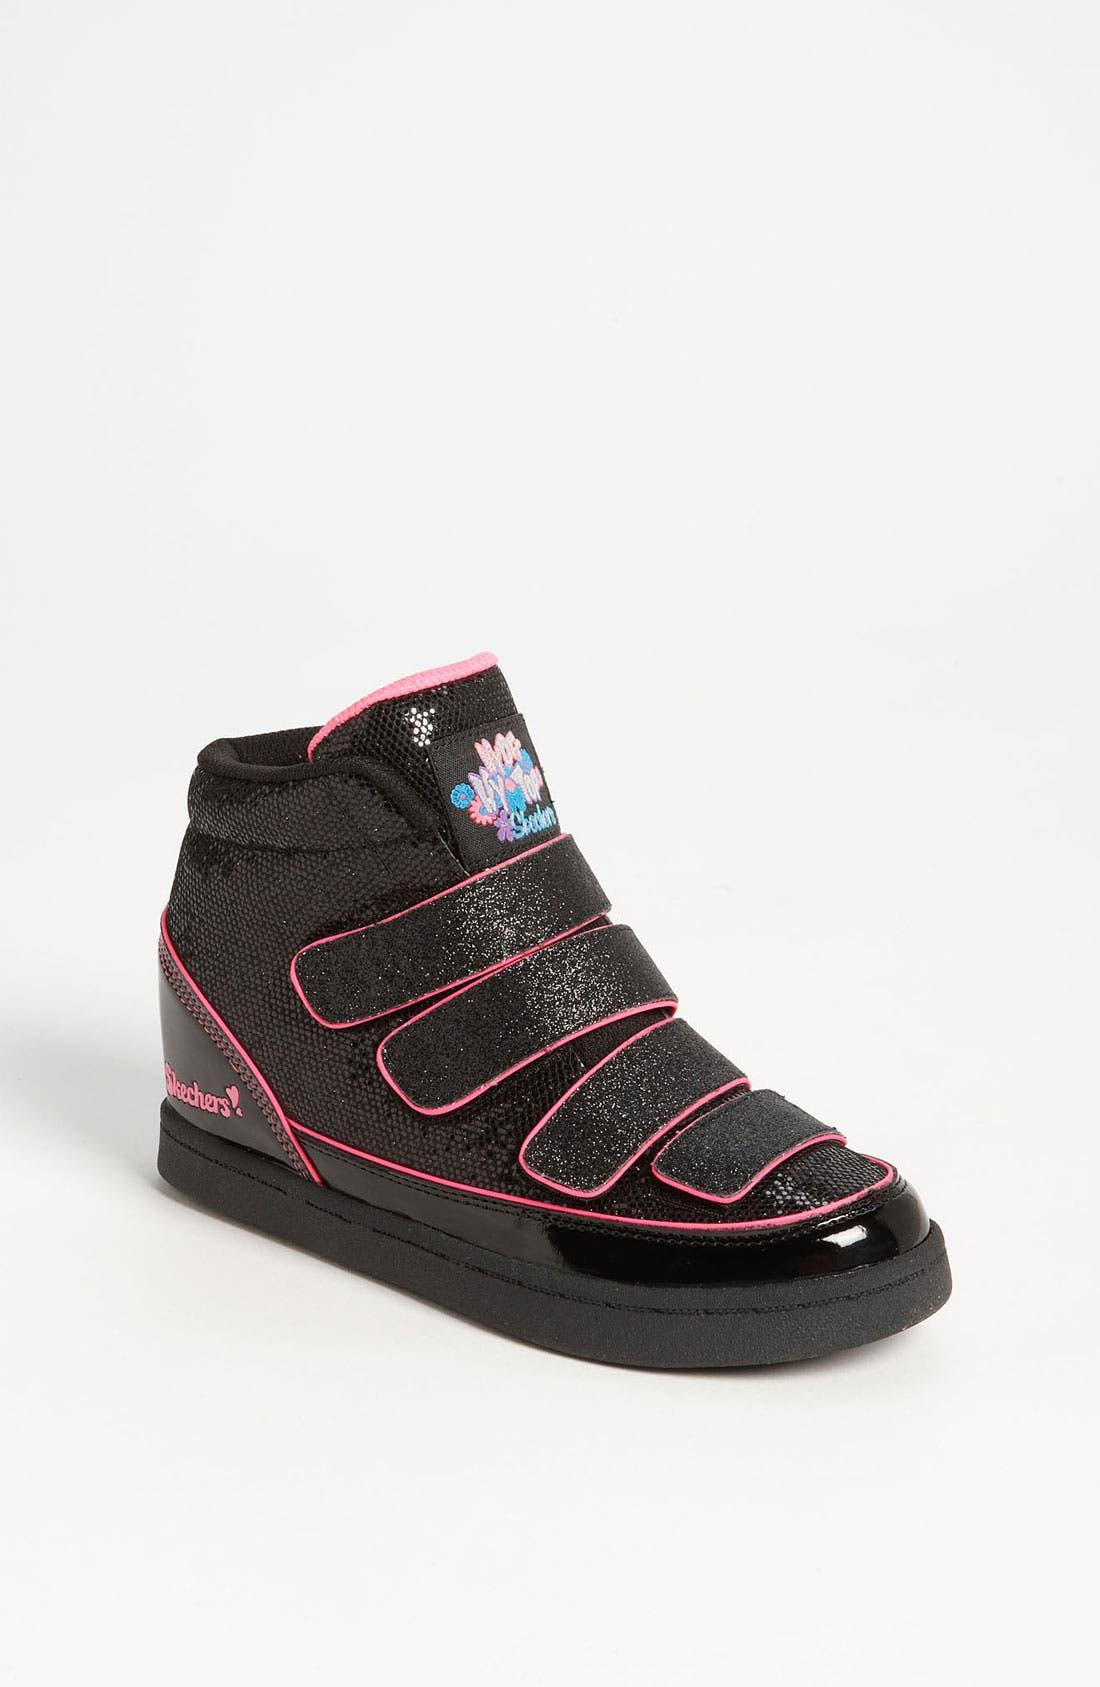 Main Image - SKECHERS '4 Upz' Sneaker (Toddler, Little Kid & Big Kid)